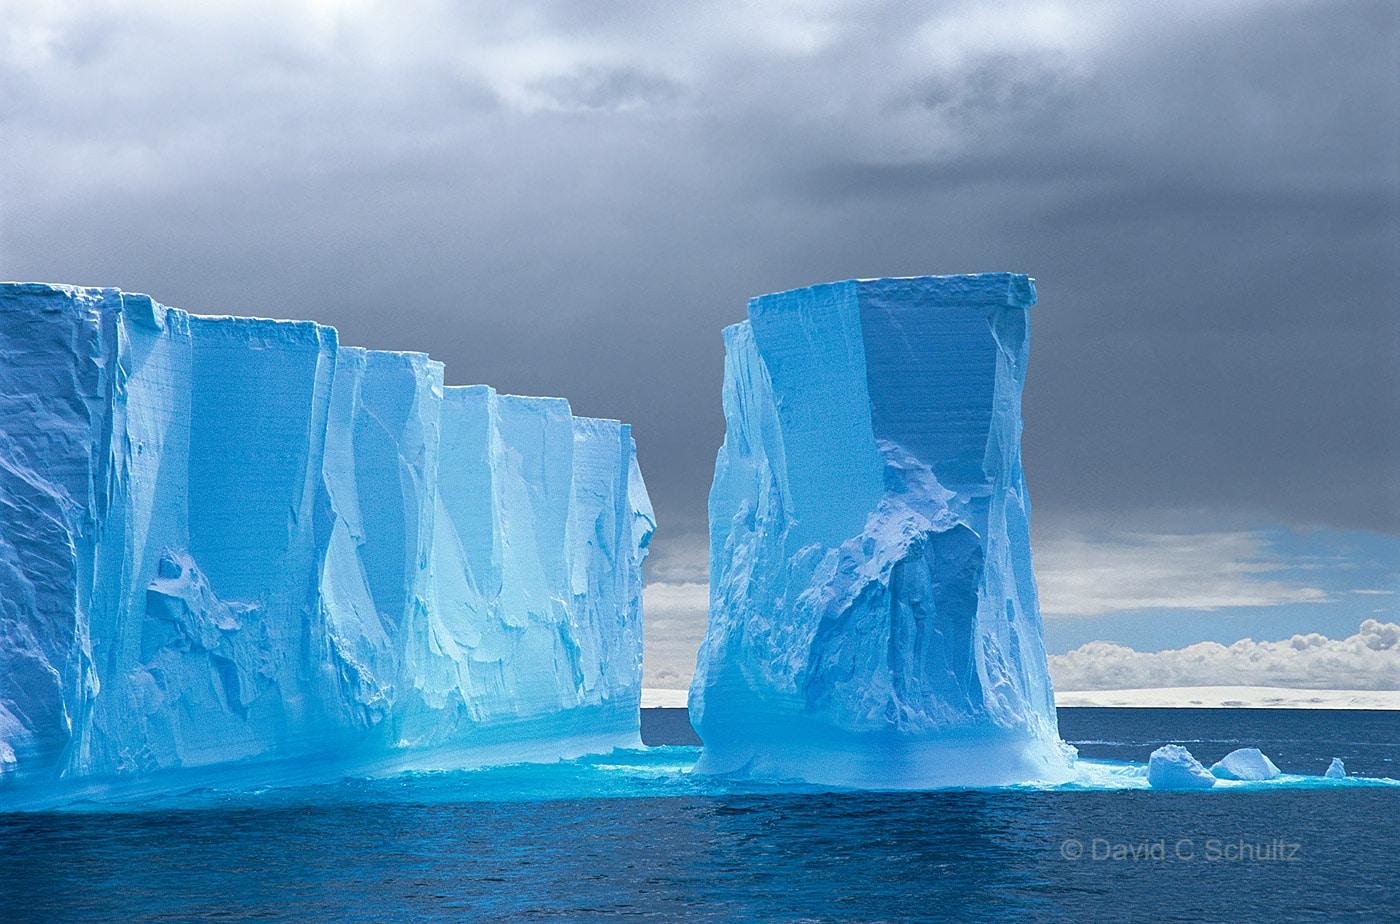 Tabular iceberg in Antarctica - Image #167-42